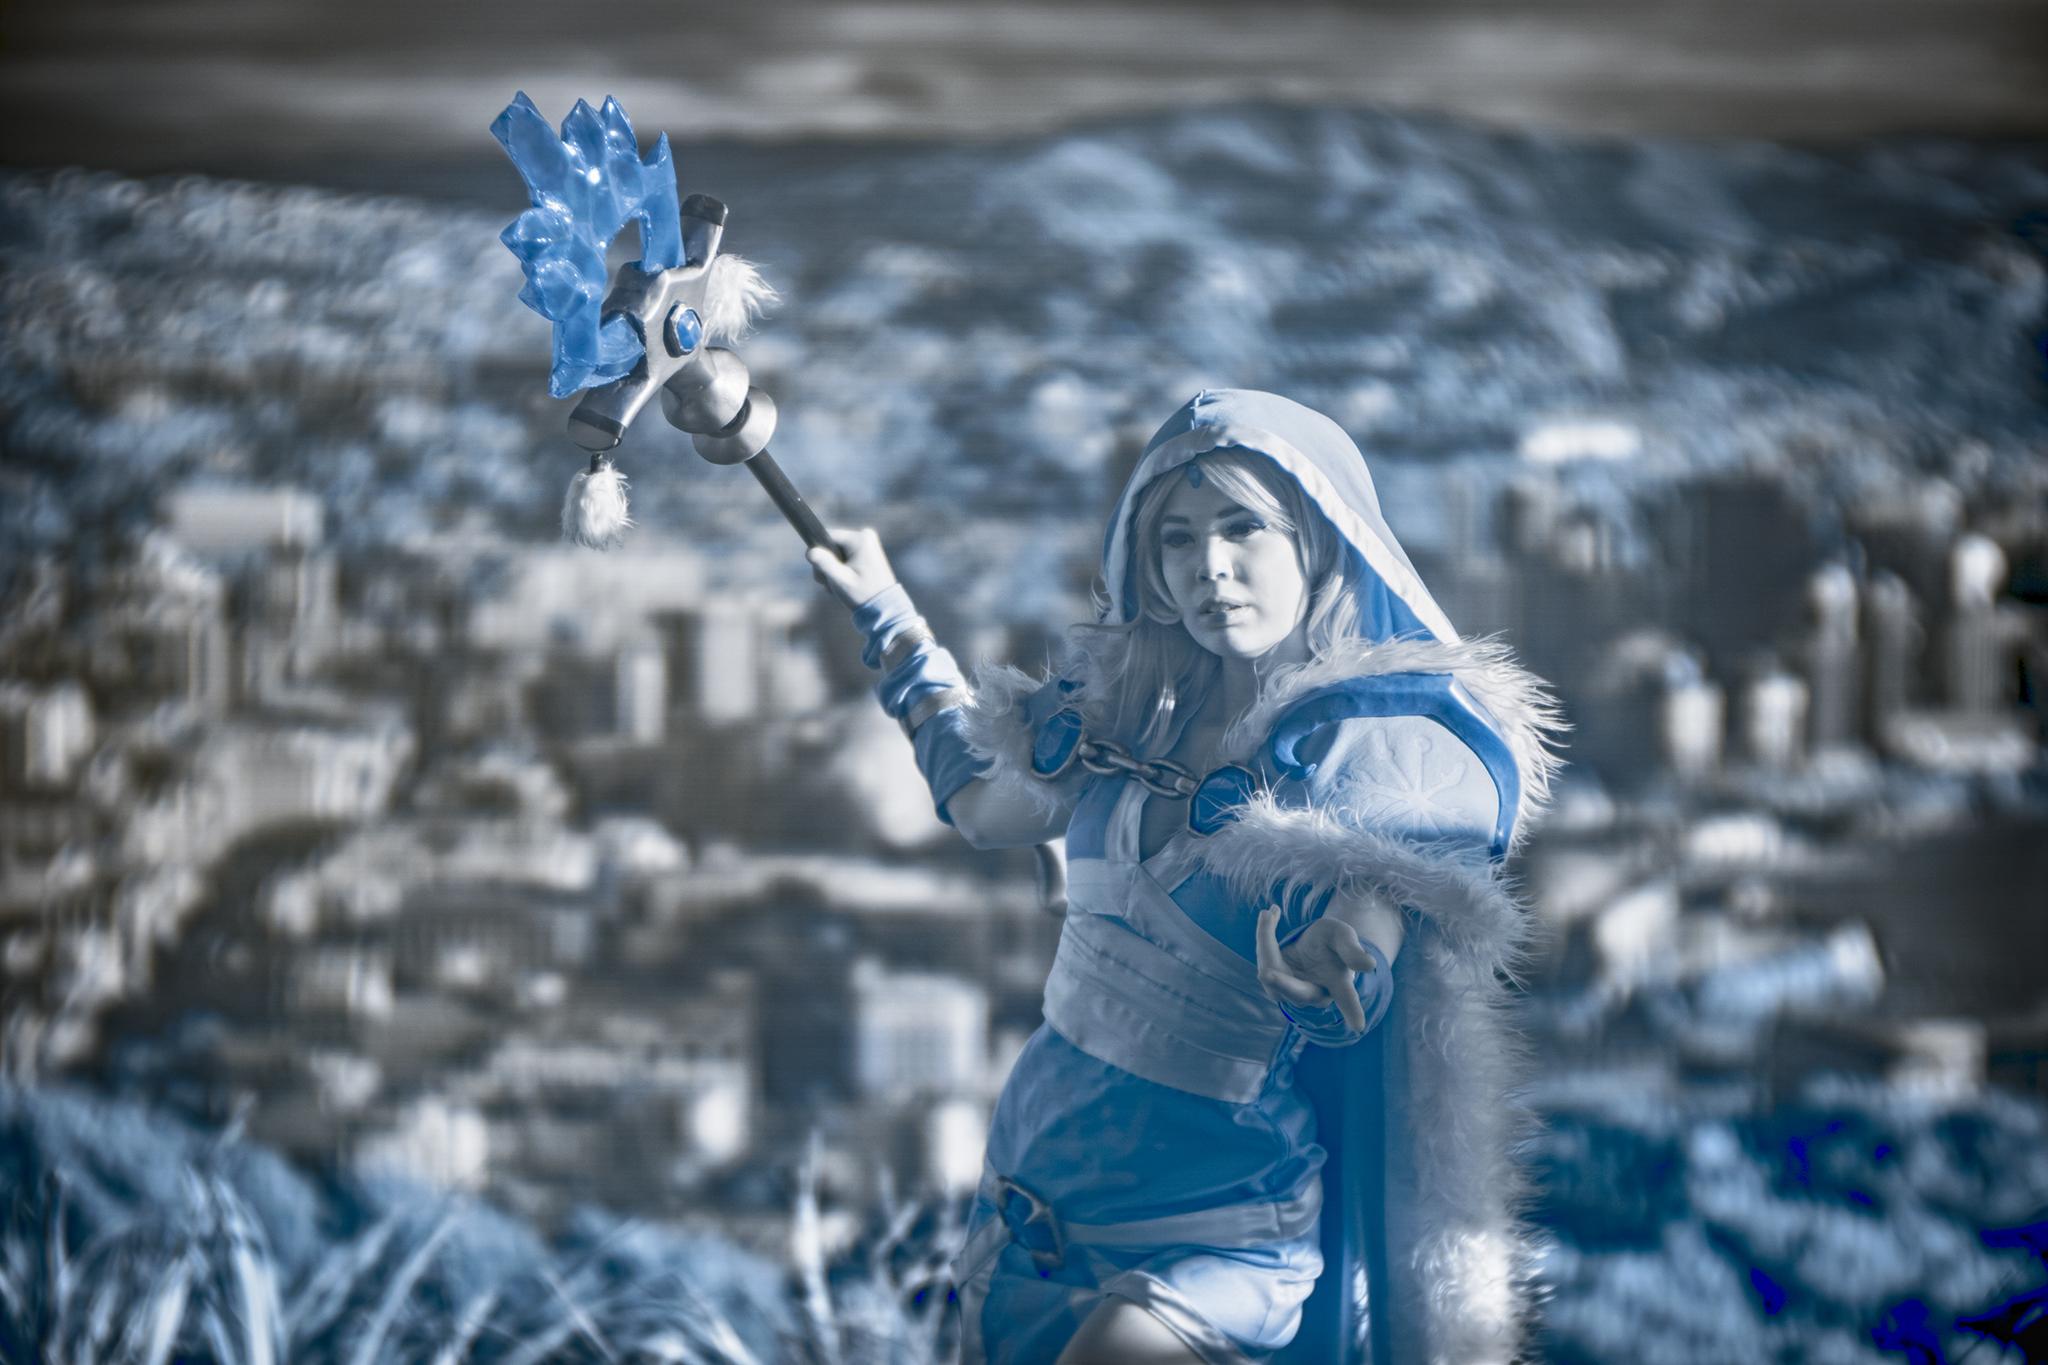 Comicon ice maiden